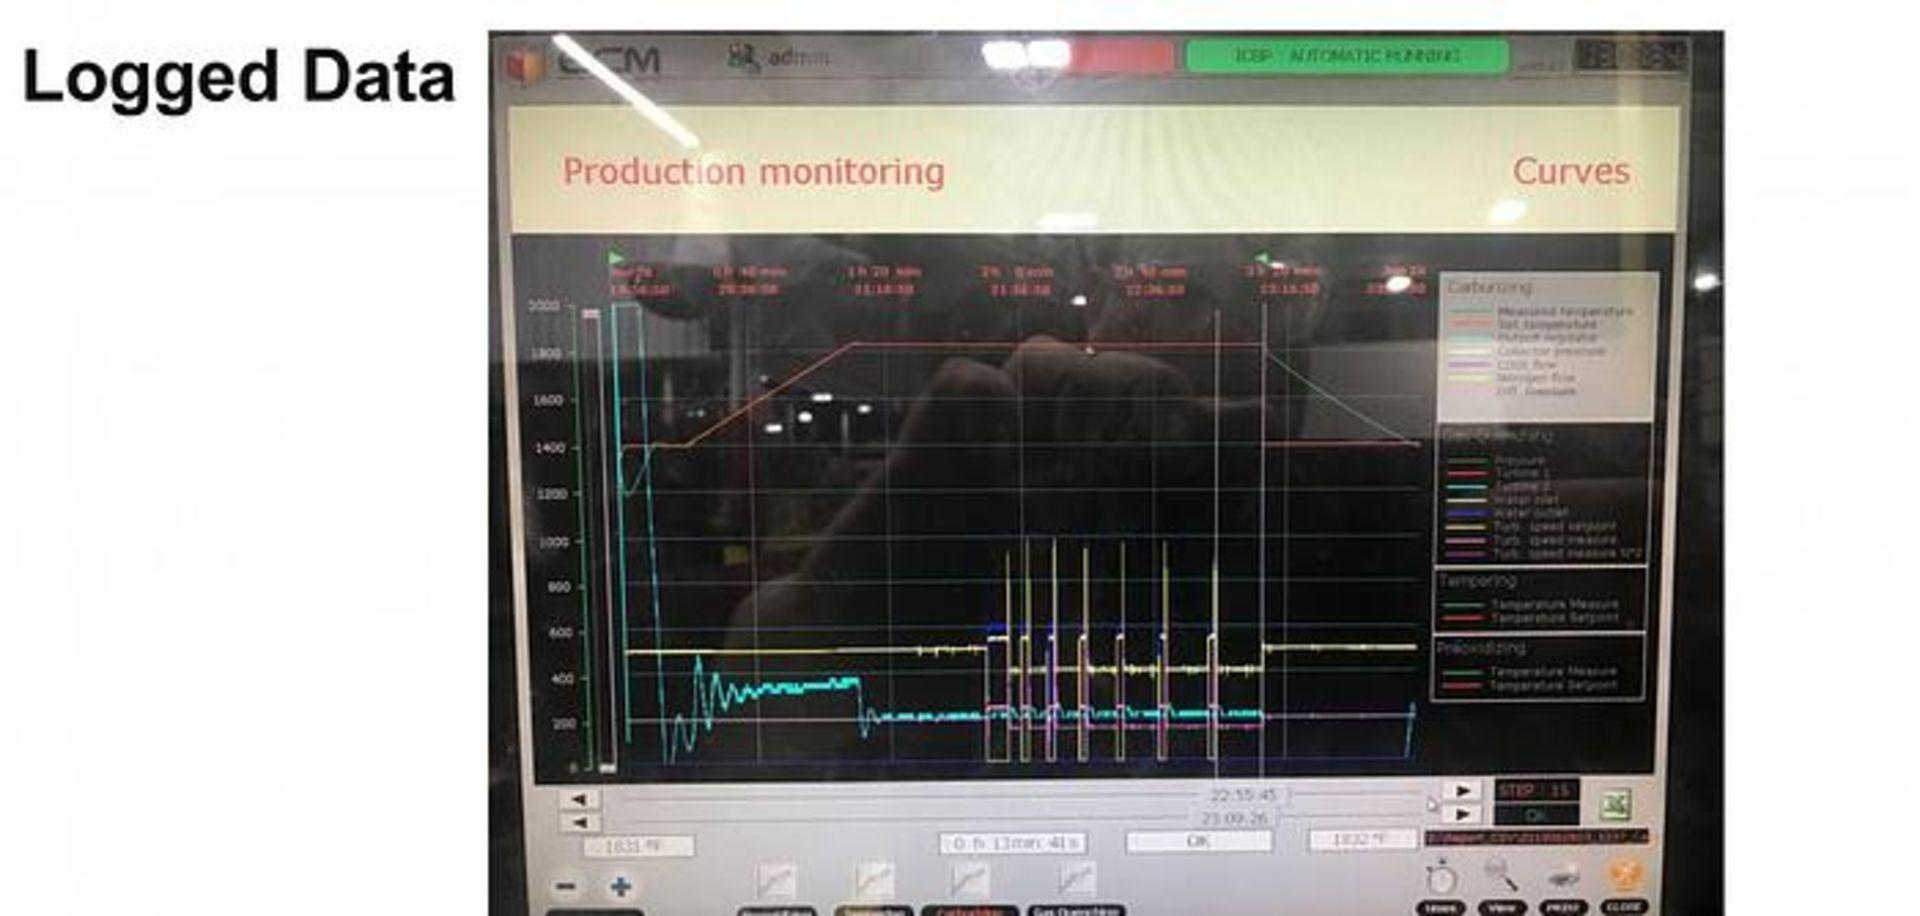 ECM TECHNOLOGIES VACUM CARBURIZING FURNACE, NEW 2013, SN 3100-500 - Image 33 of 50